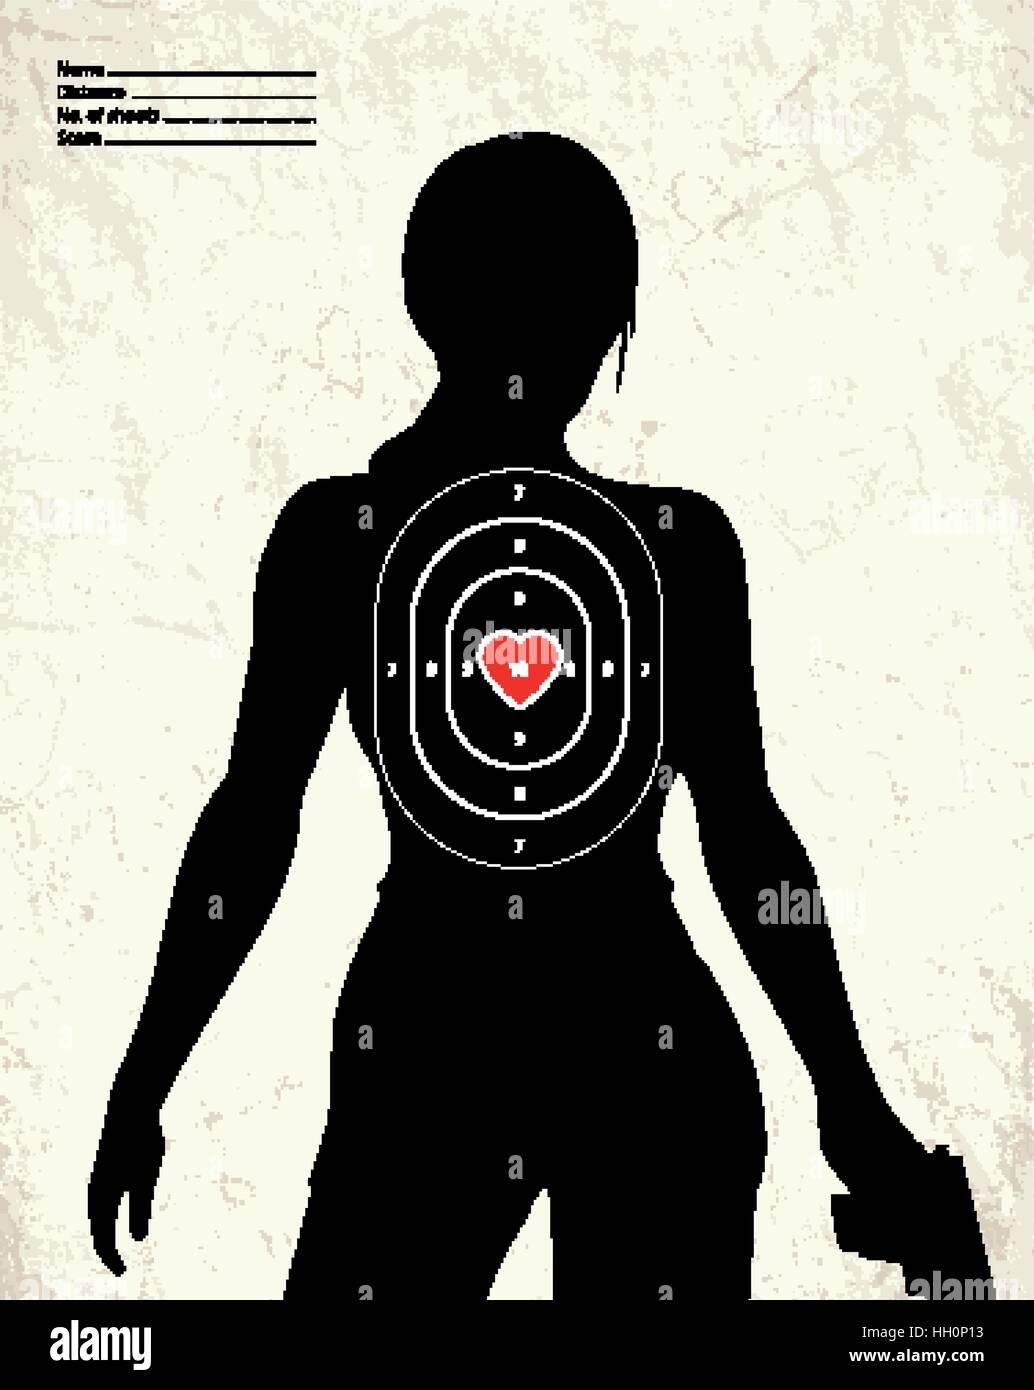 119376a127165 Dangerous armed woman - shooting range target Stock Vector Art ...